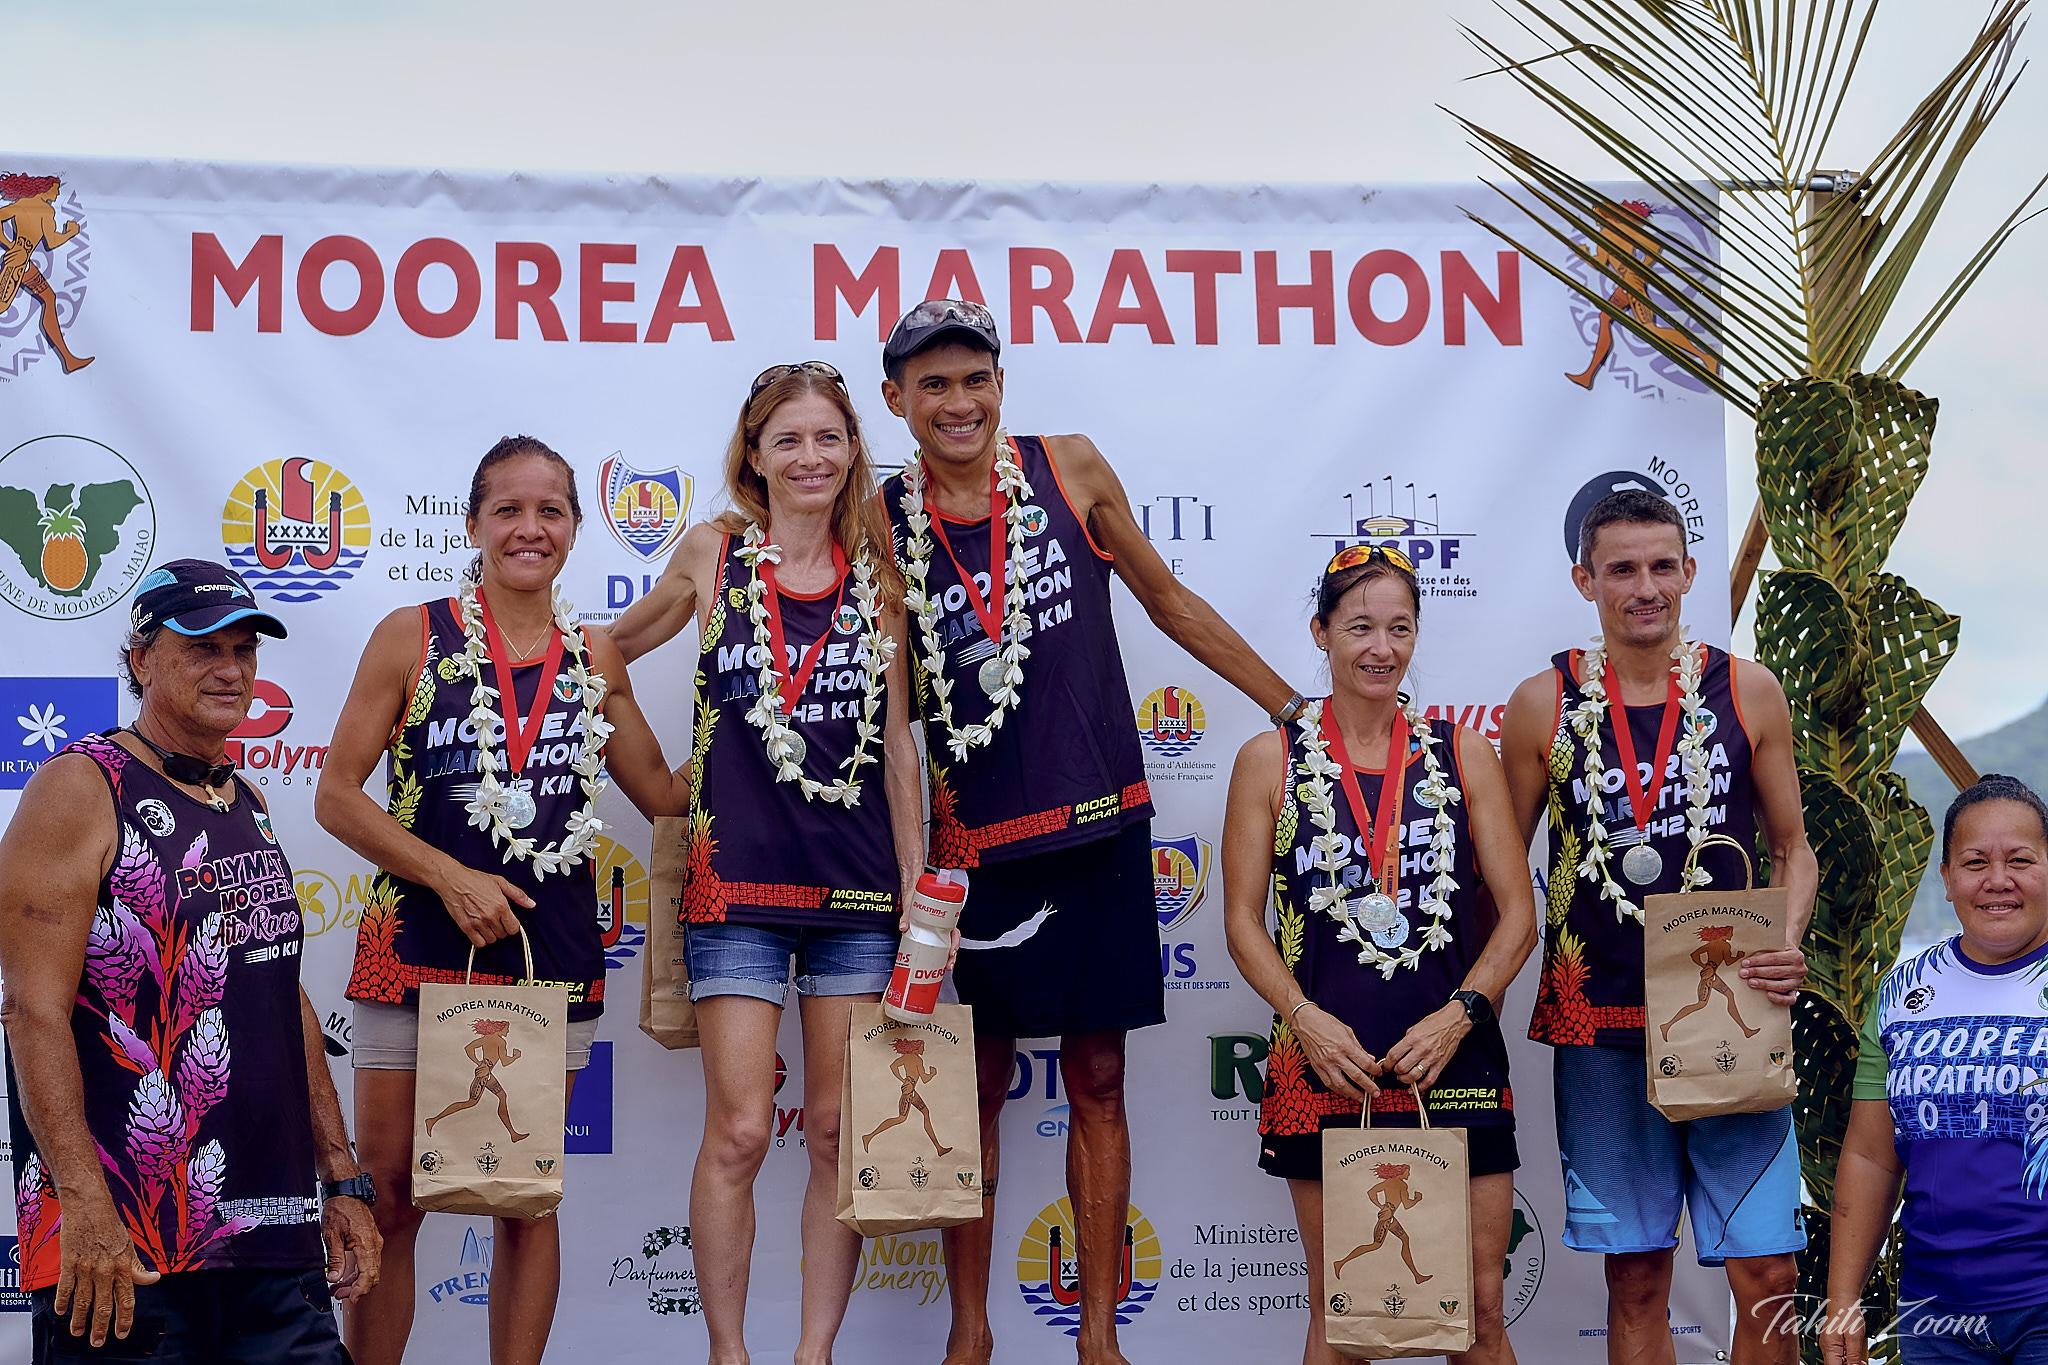 Le podium de la course reine © Tahiti Zoom/Moorea Events